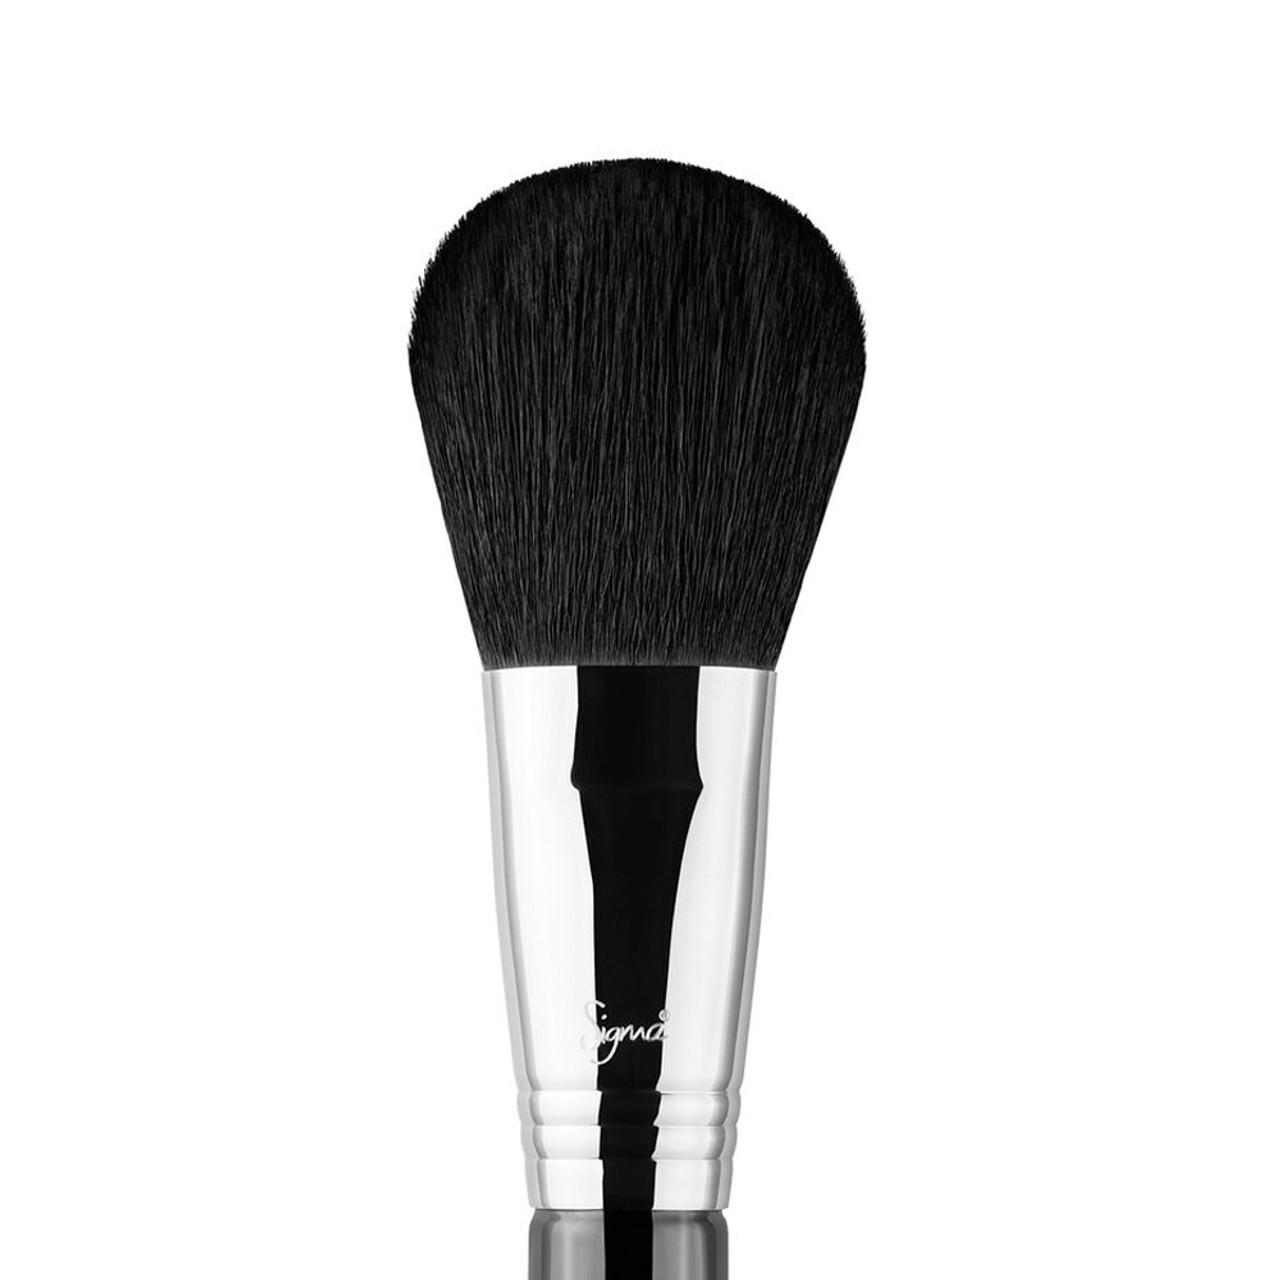 Sigma Beauty F20 - Large Powder Brush (discontinued) BeautifiedYou.com